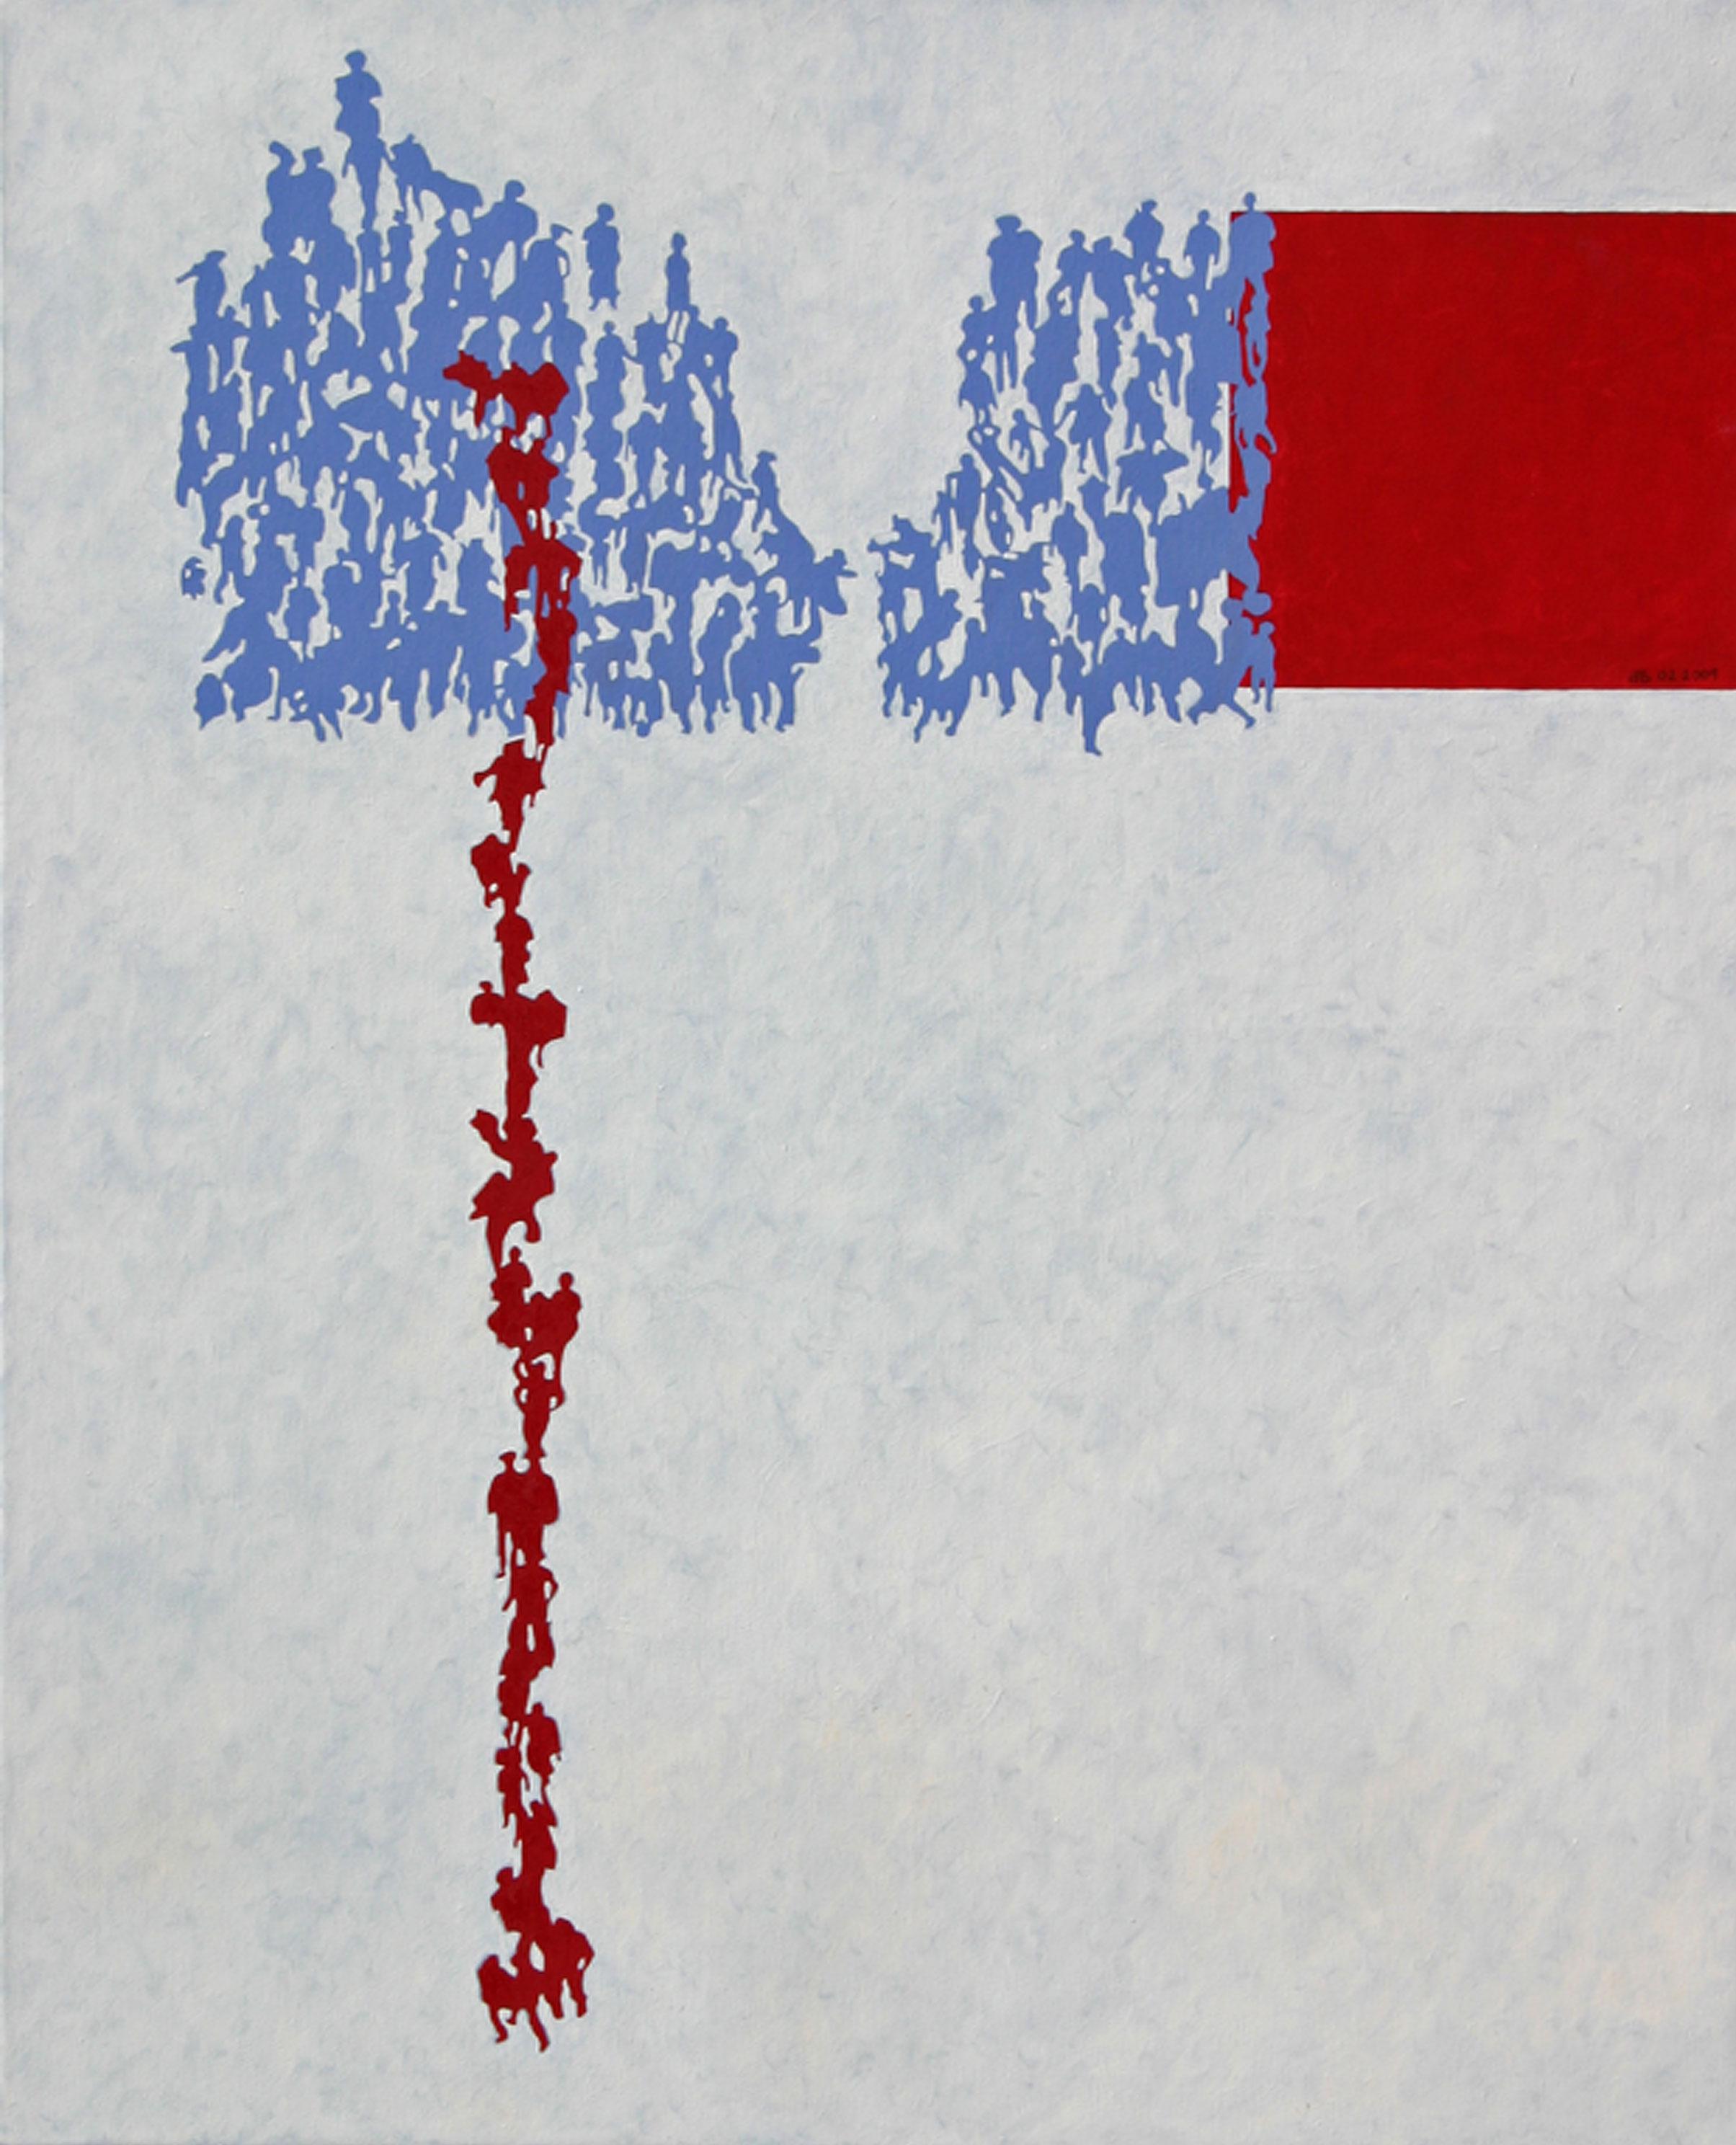 Rotes Kreuz.